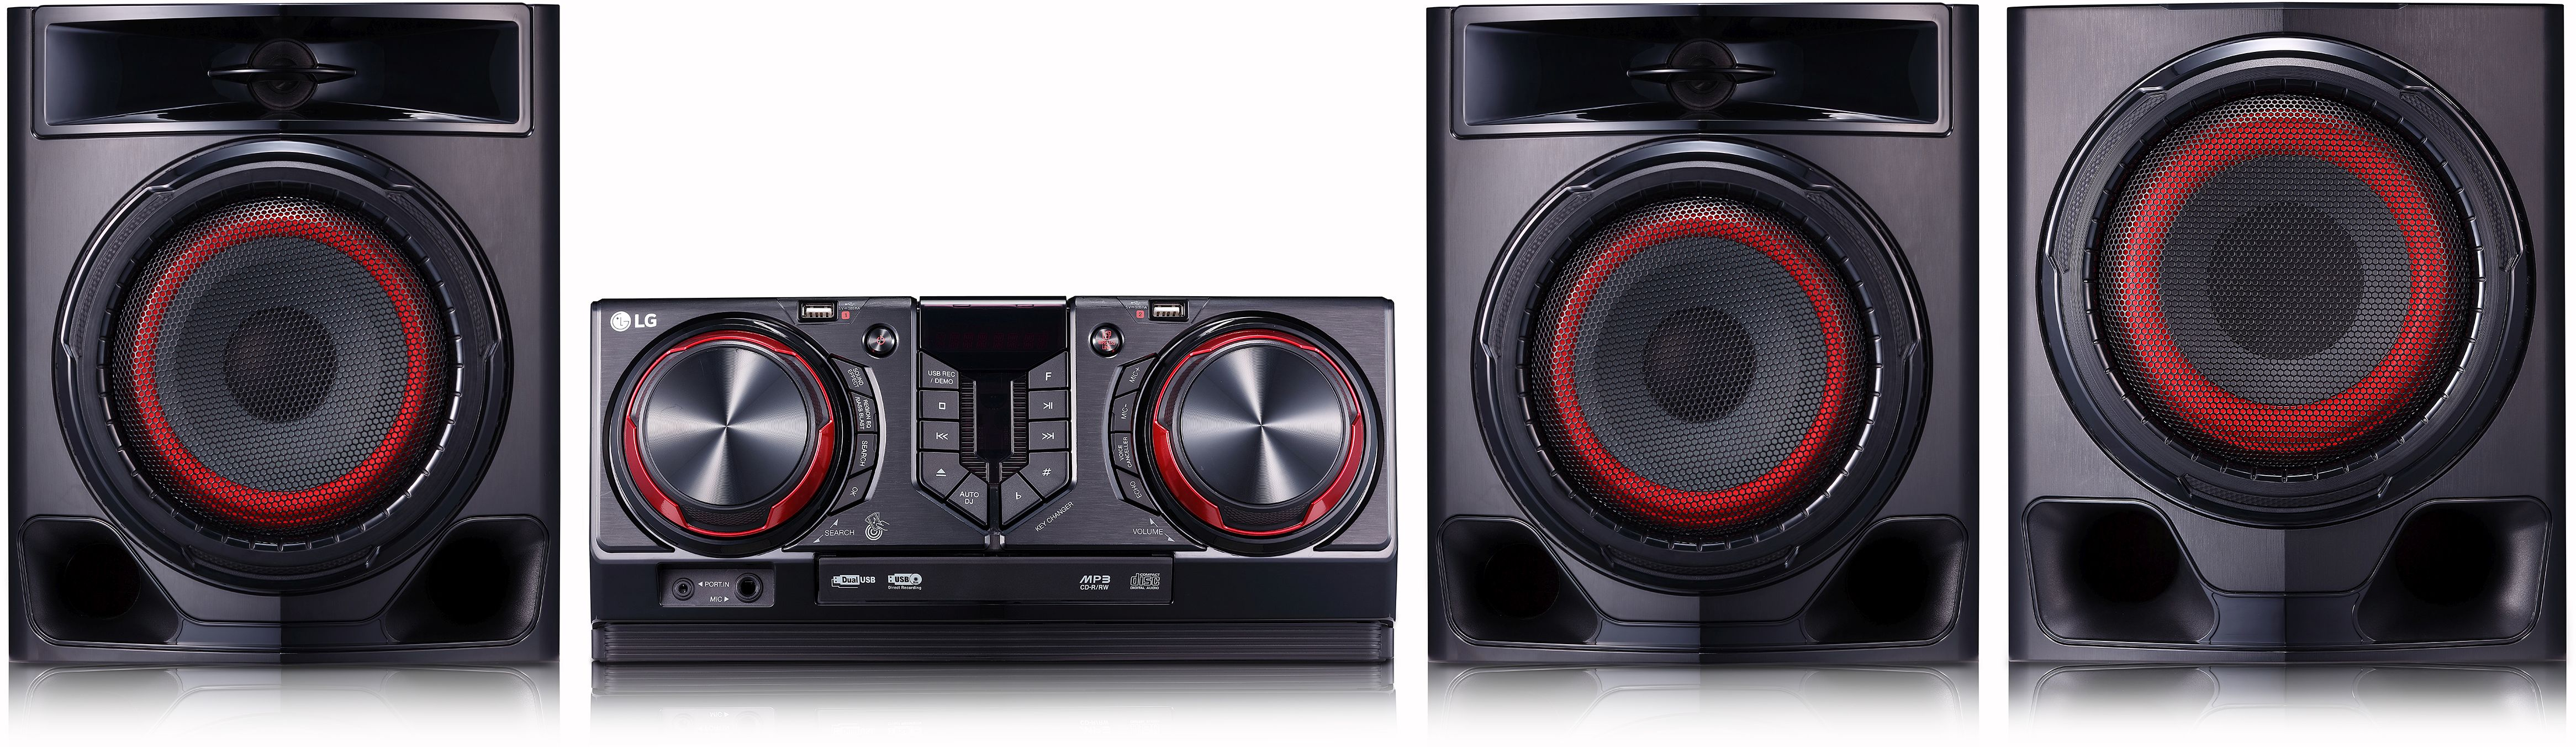 LG XBOOM 720W Hi-Fi Entertainment System-CJ45 | Foothill Appliance